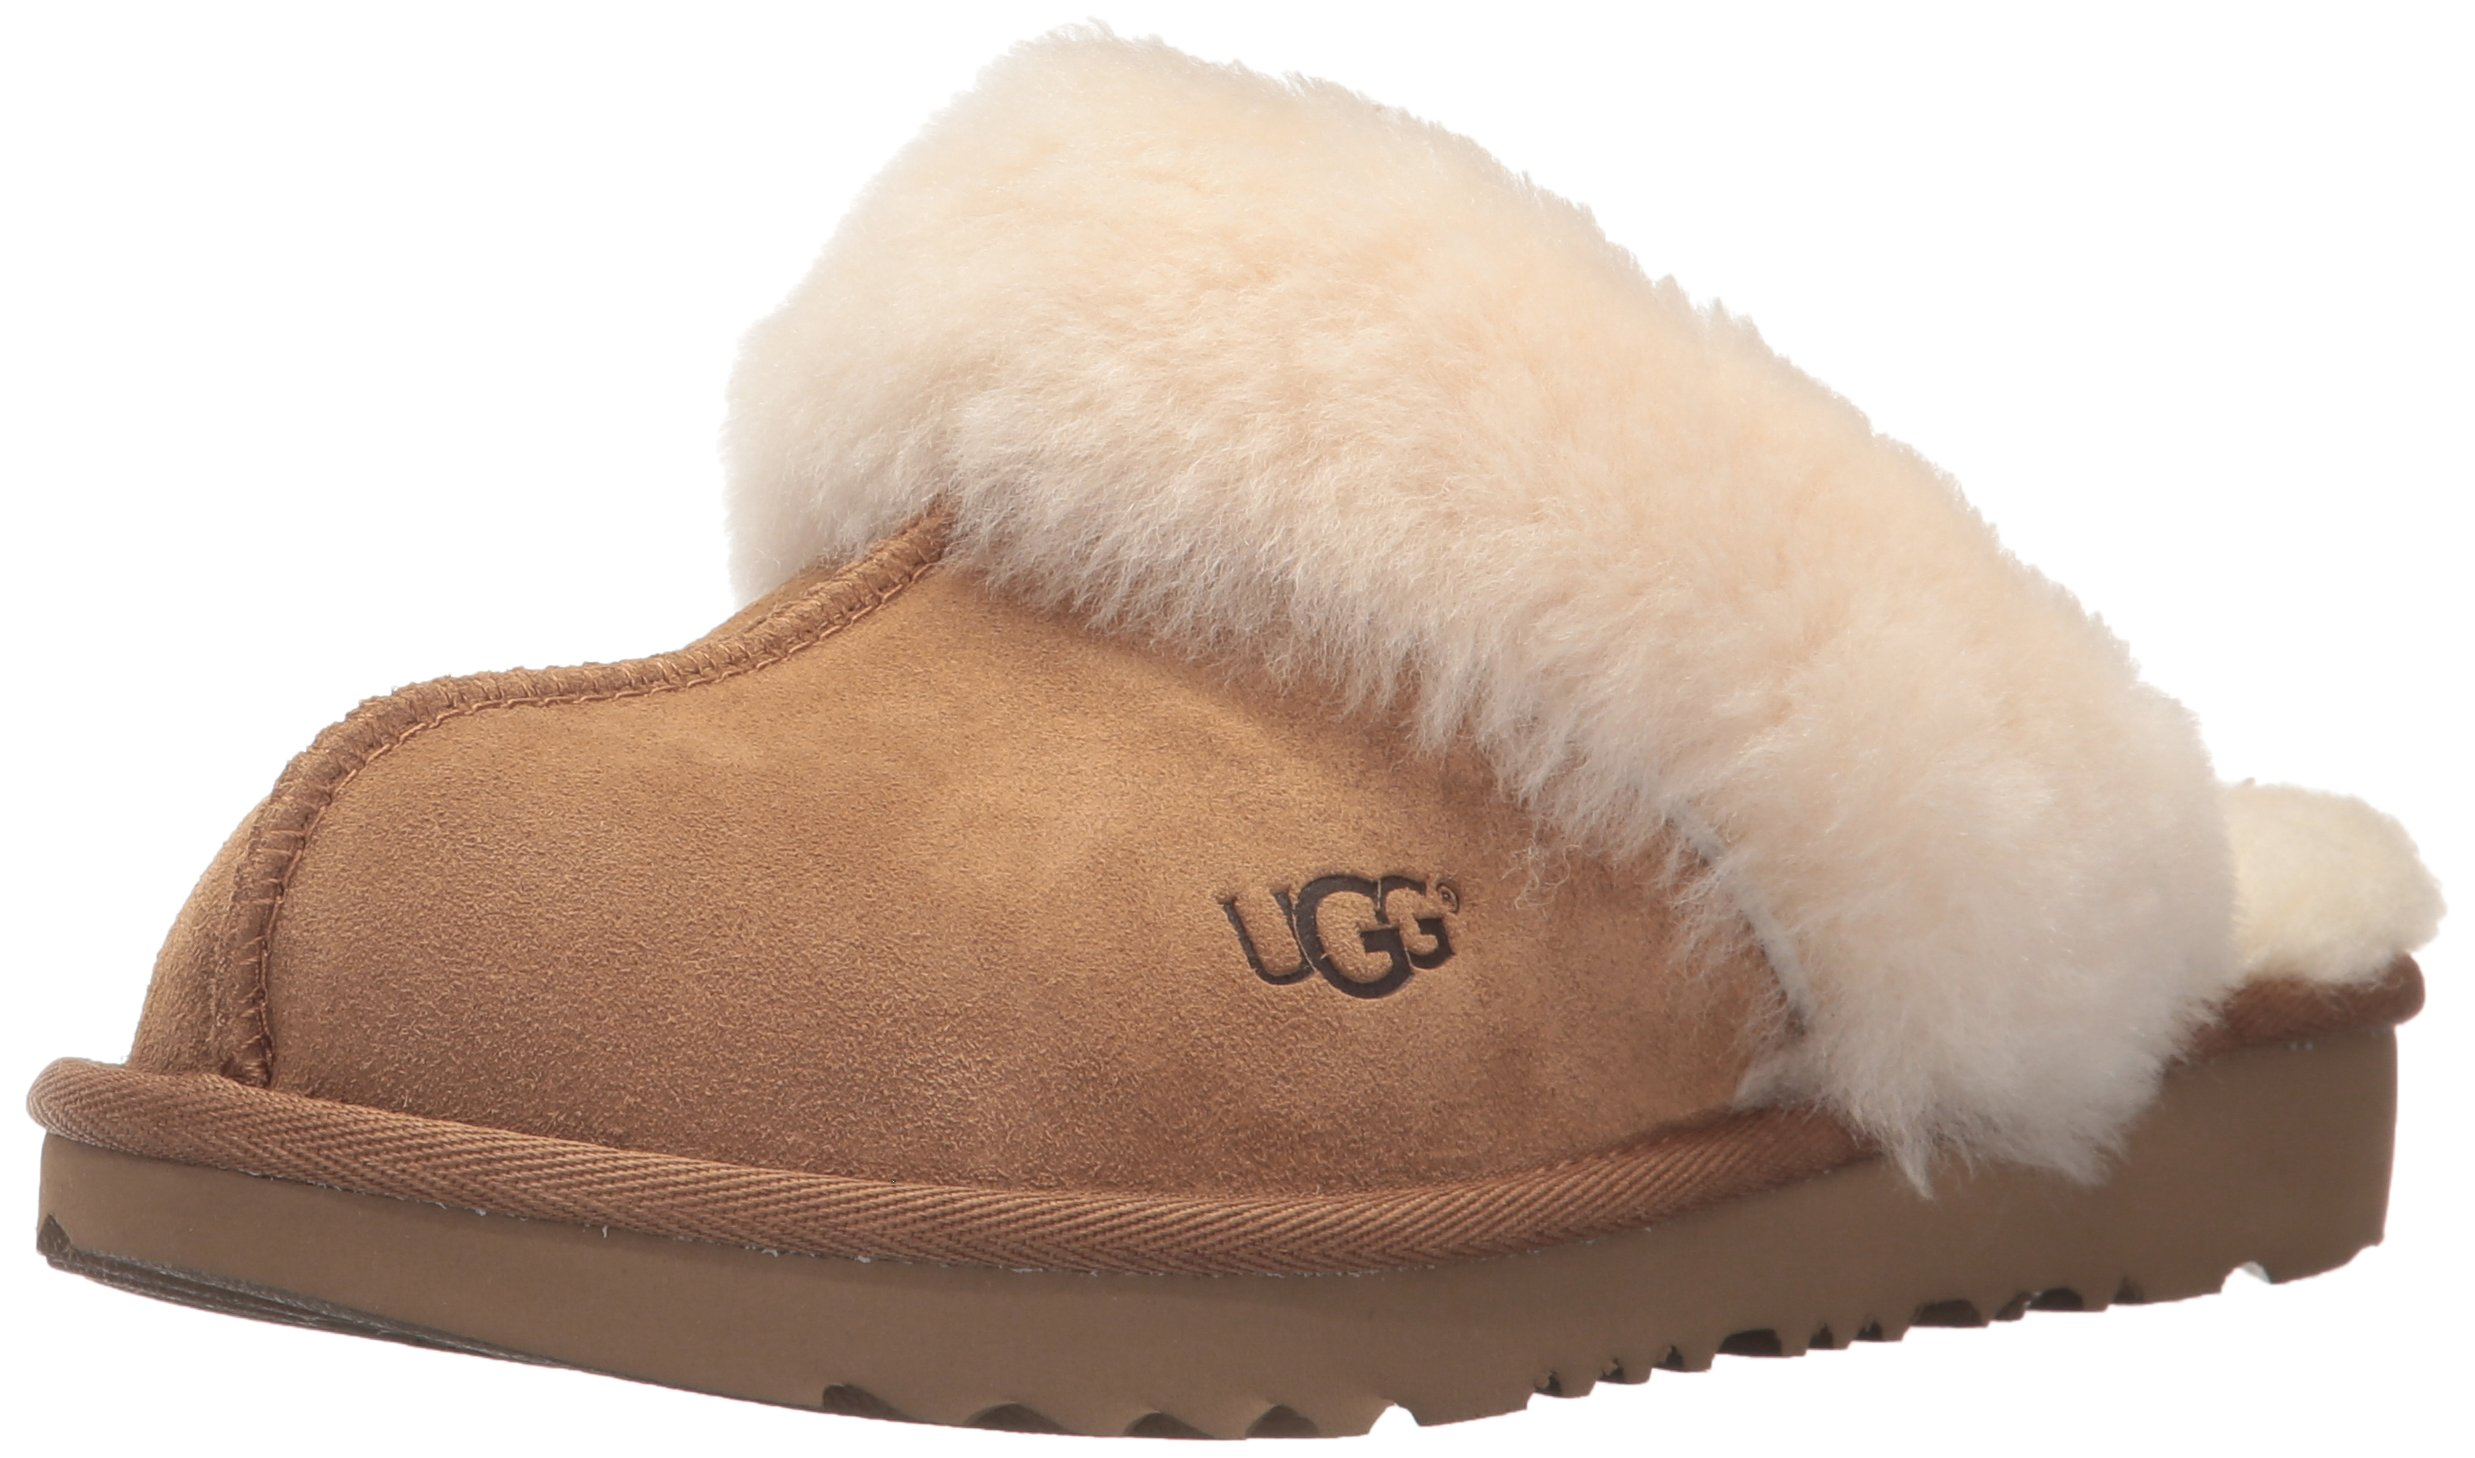 UGG Girls K Cozy II Slipper, Chestnut, 13 M US Little Kid by UGG (Image #1)